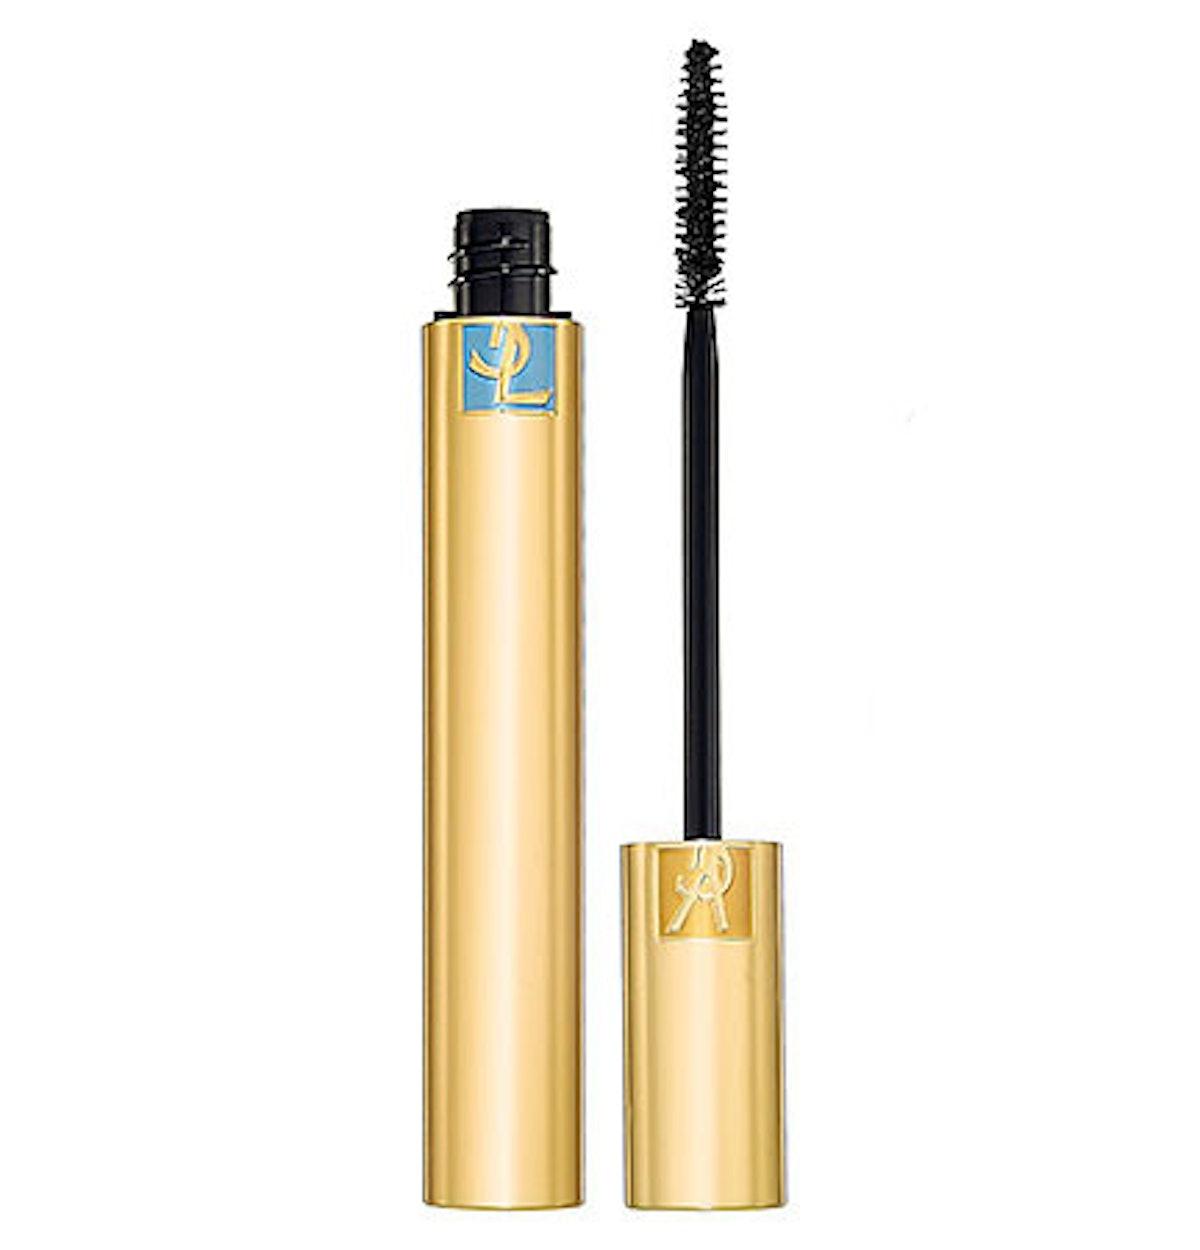 Yves Saint Laurent CILS Waterproof Luxurious Mascara